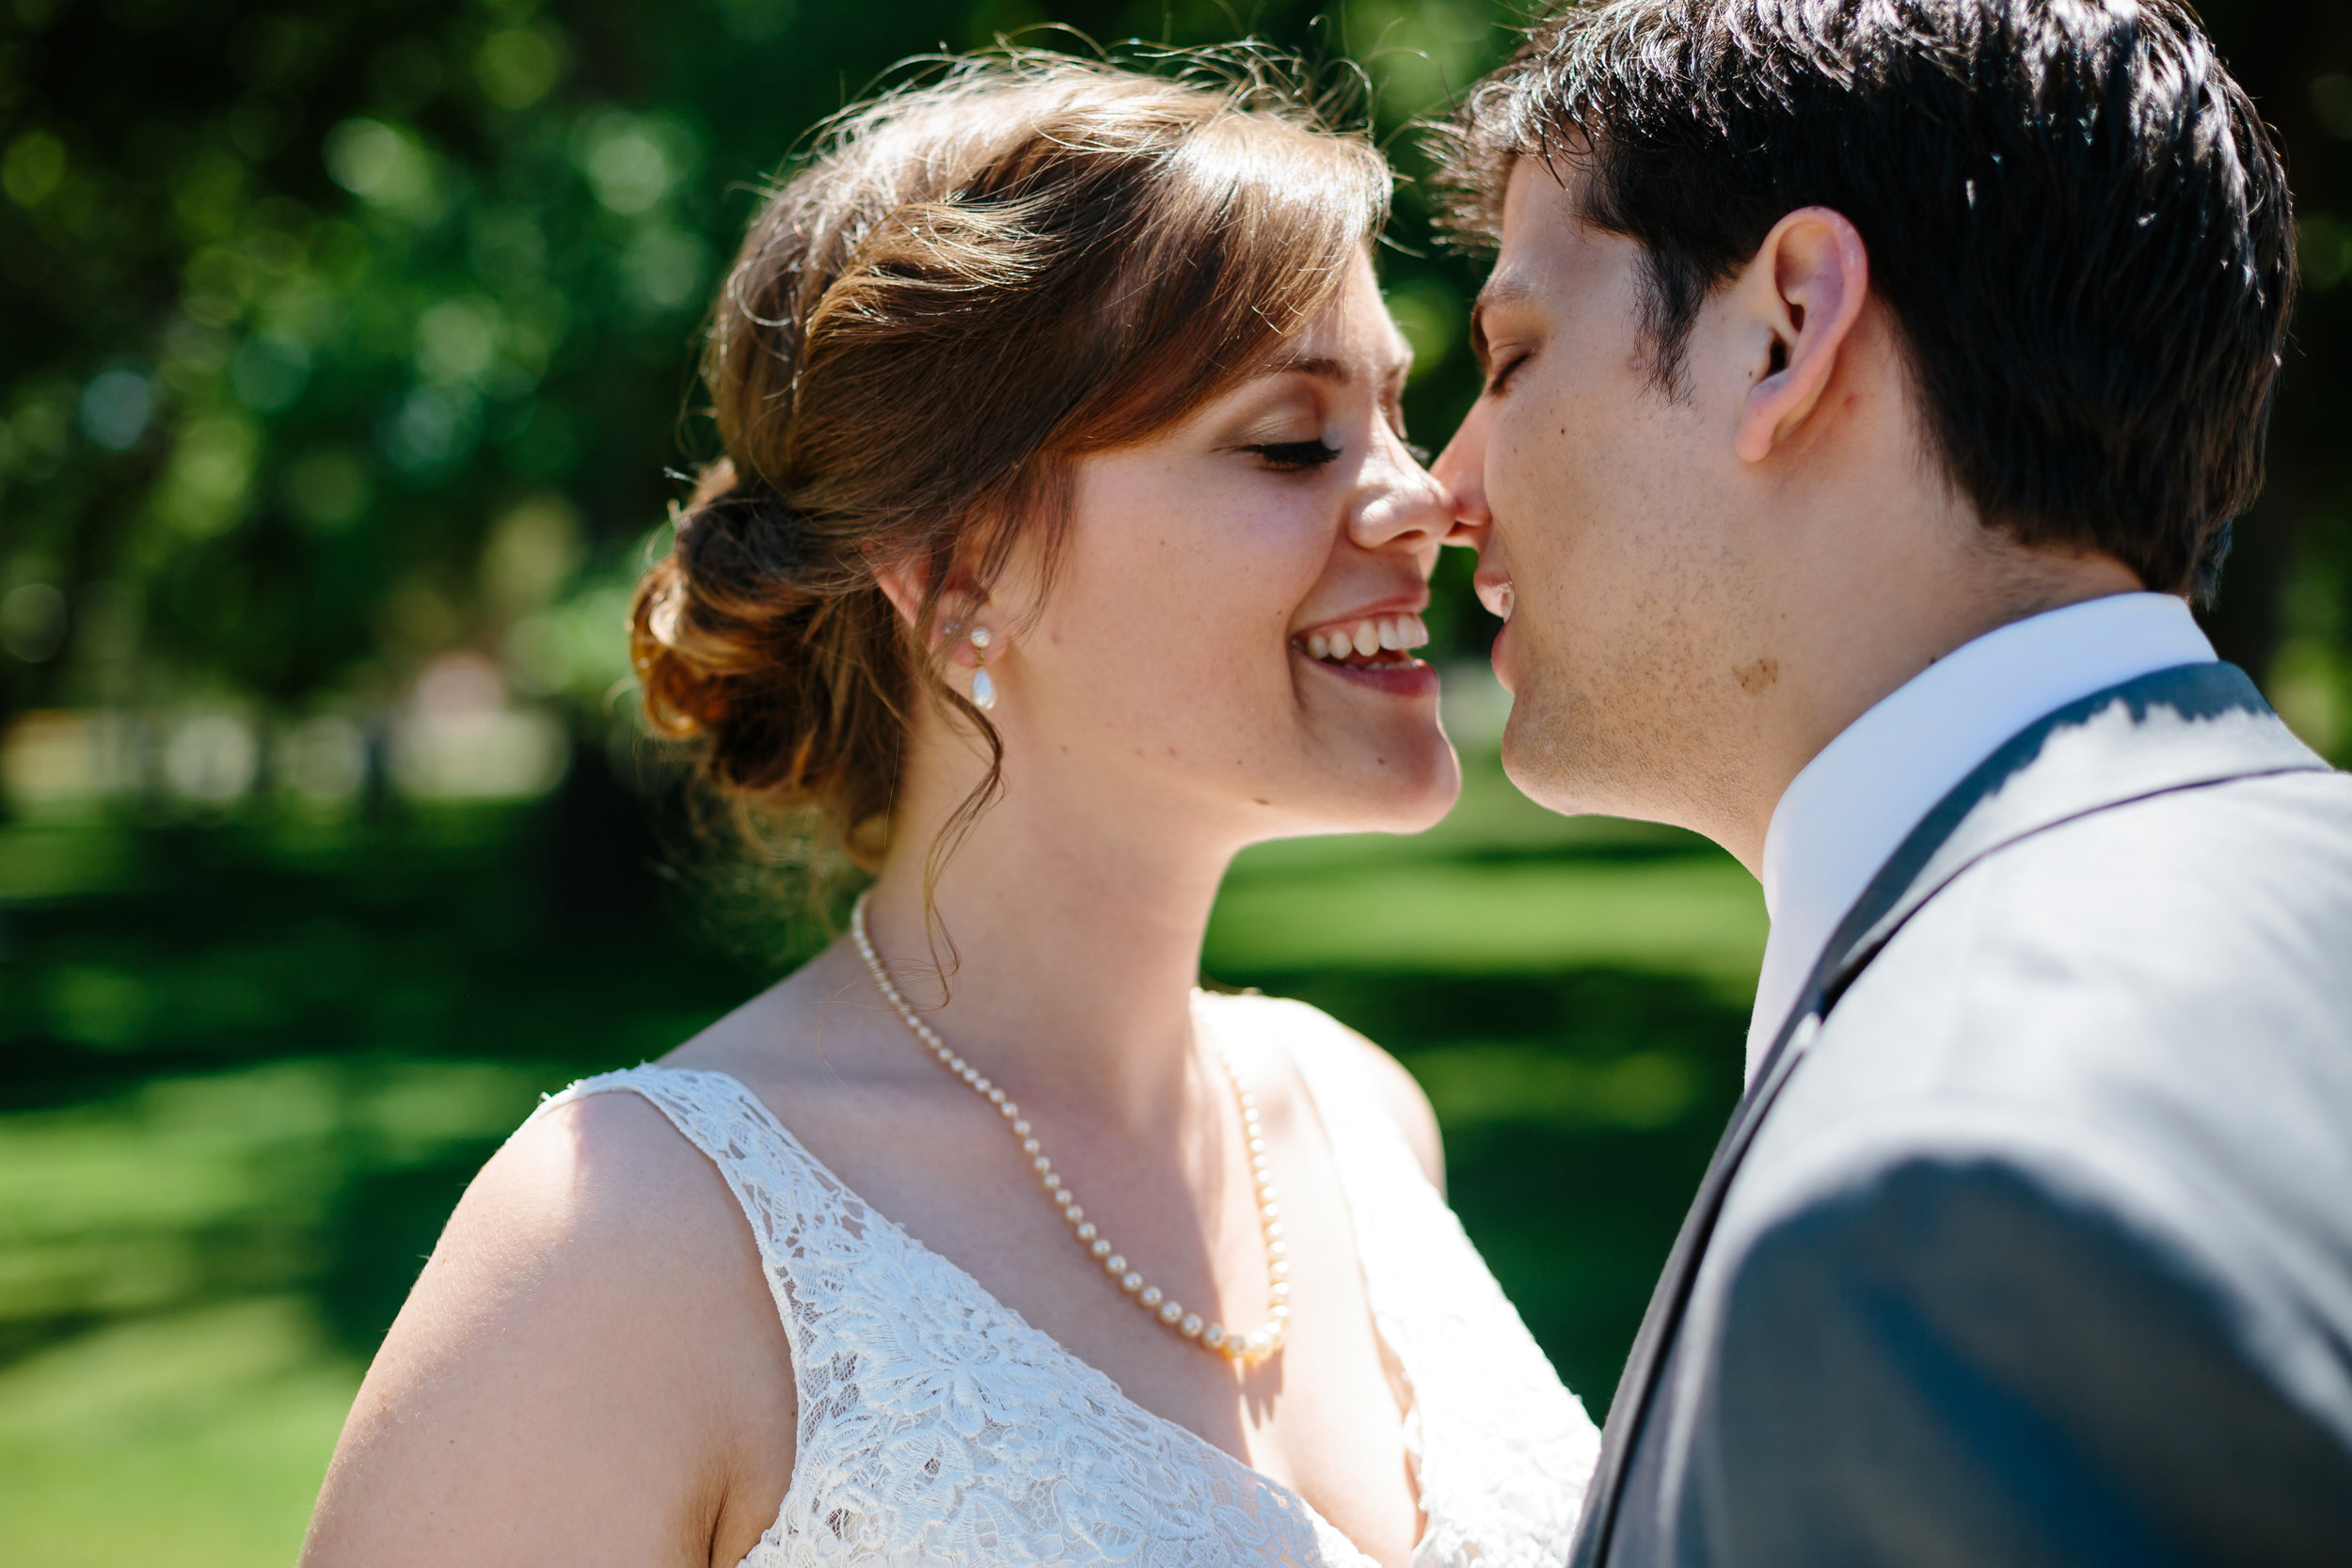 Jordan & Shantel Married - Idaho - Corrie Mick Photography-124.jpg